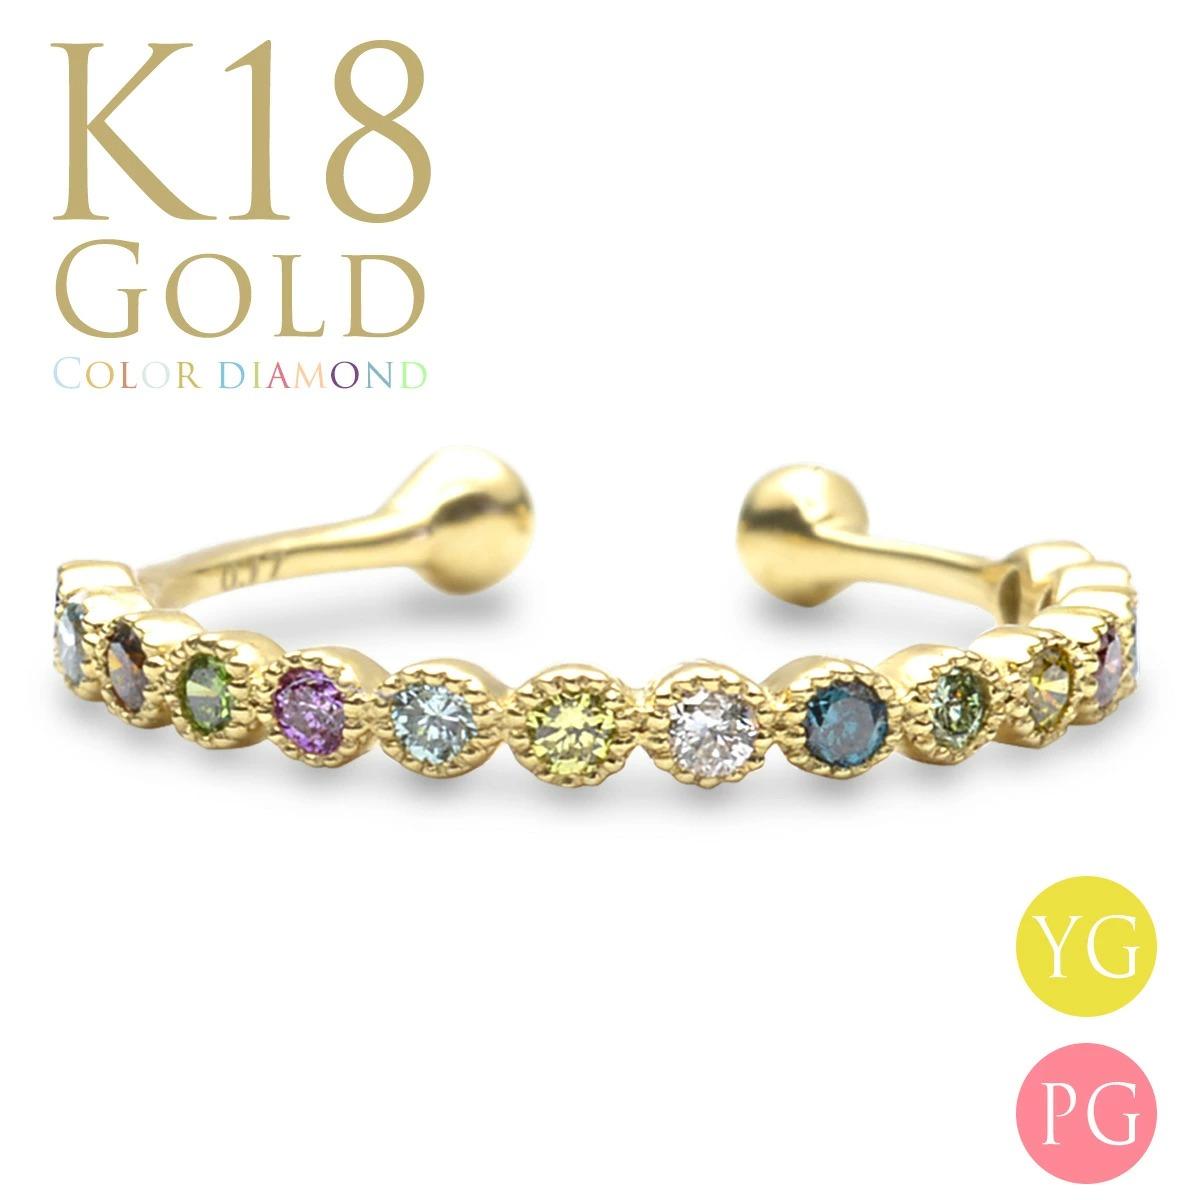 K18 ゴールド カラーダイヤモンド  ミルグレイン イヤーカフ (片耳用) RERALUy rer1659k18 新作